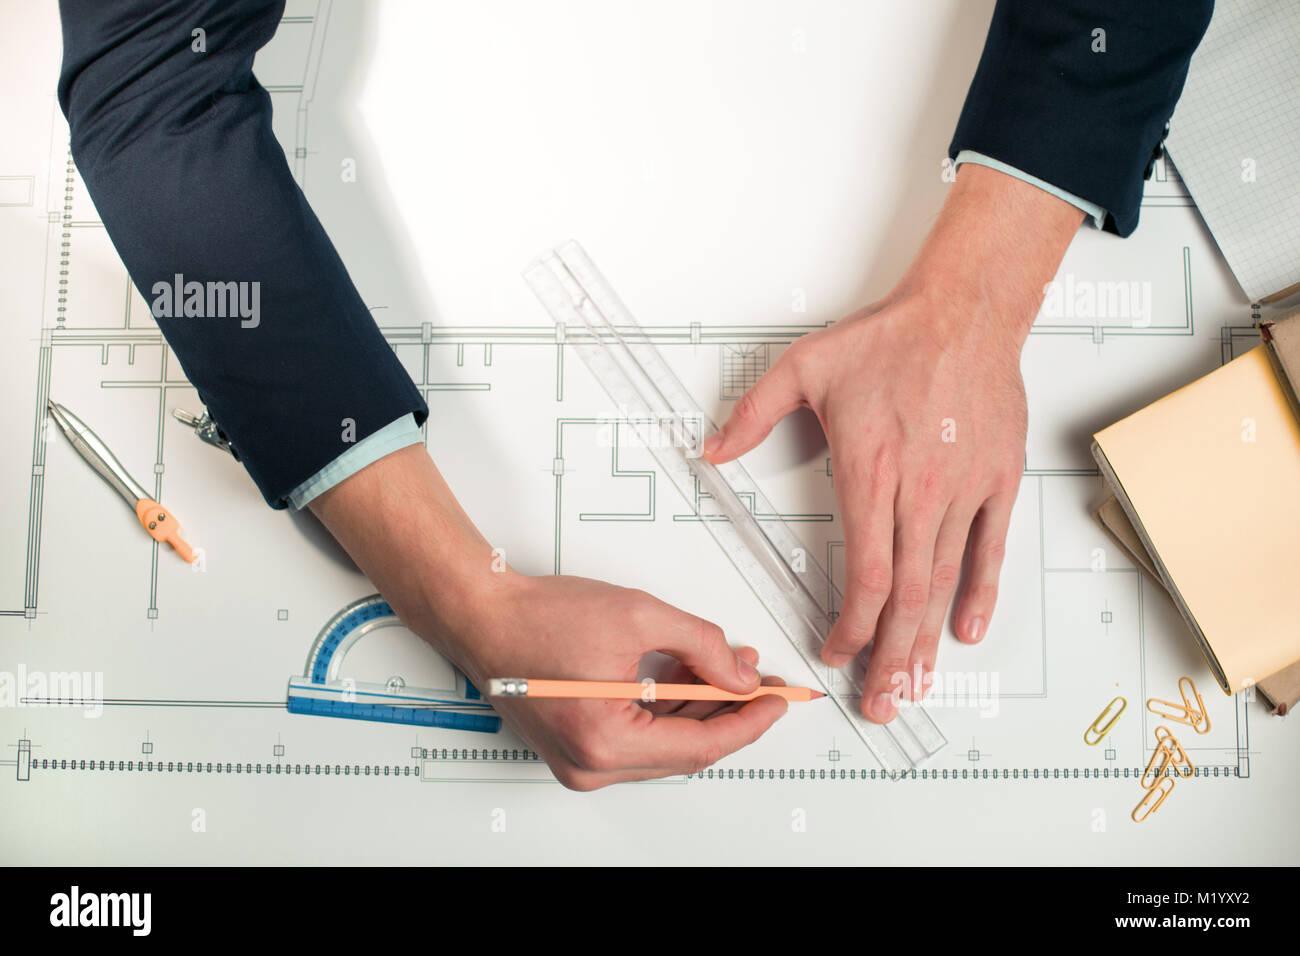 Macho joven manos dibujando blueprint Imagen De Stock